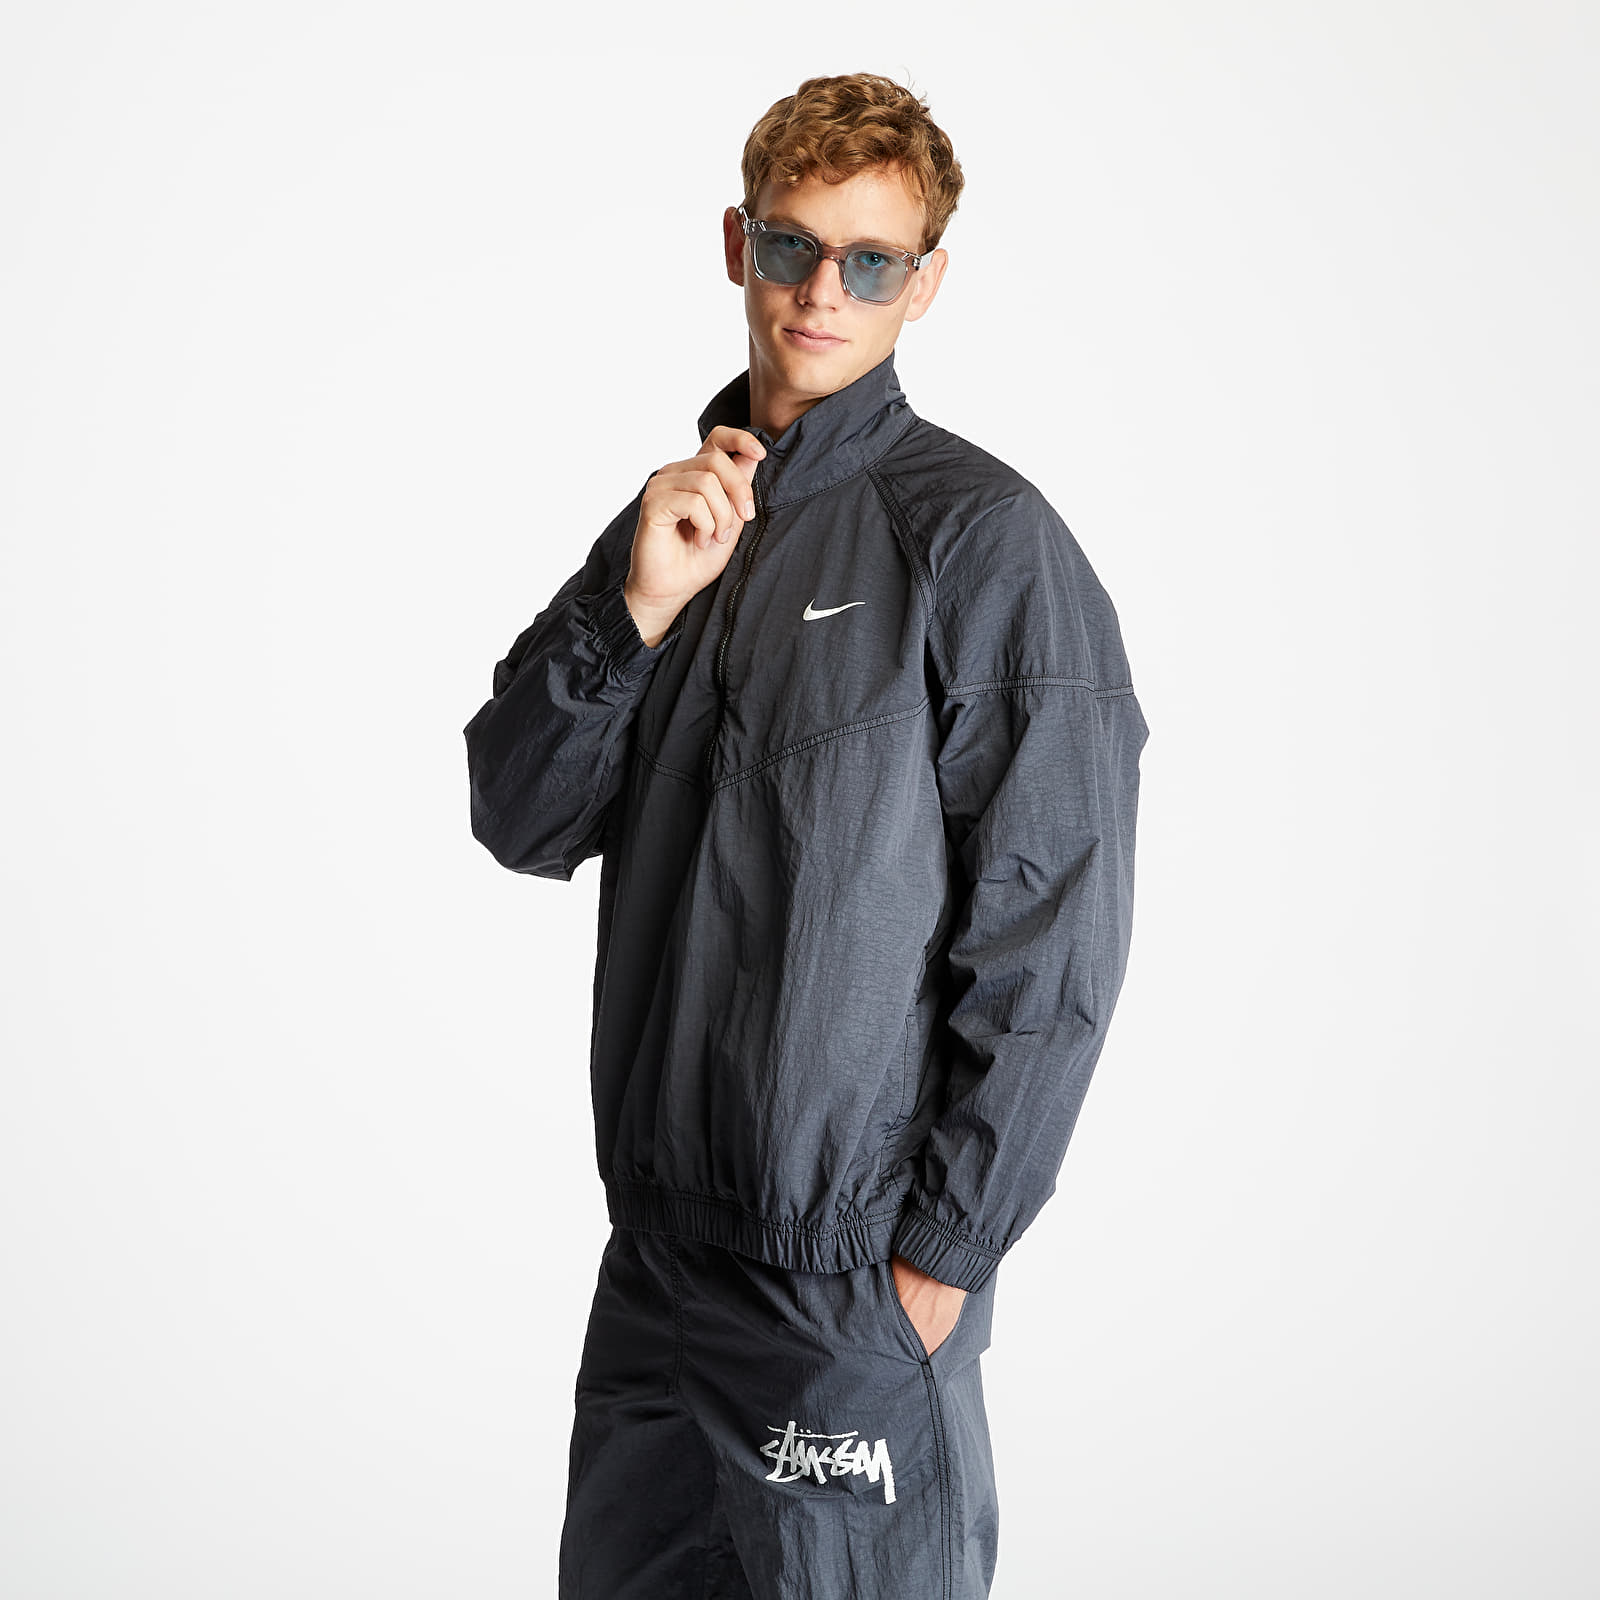 Übergangsjacken Nike x Stüssy Windrunner Jacket Off Noir